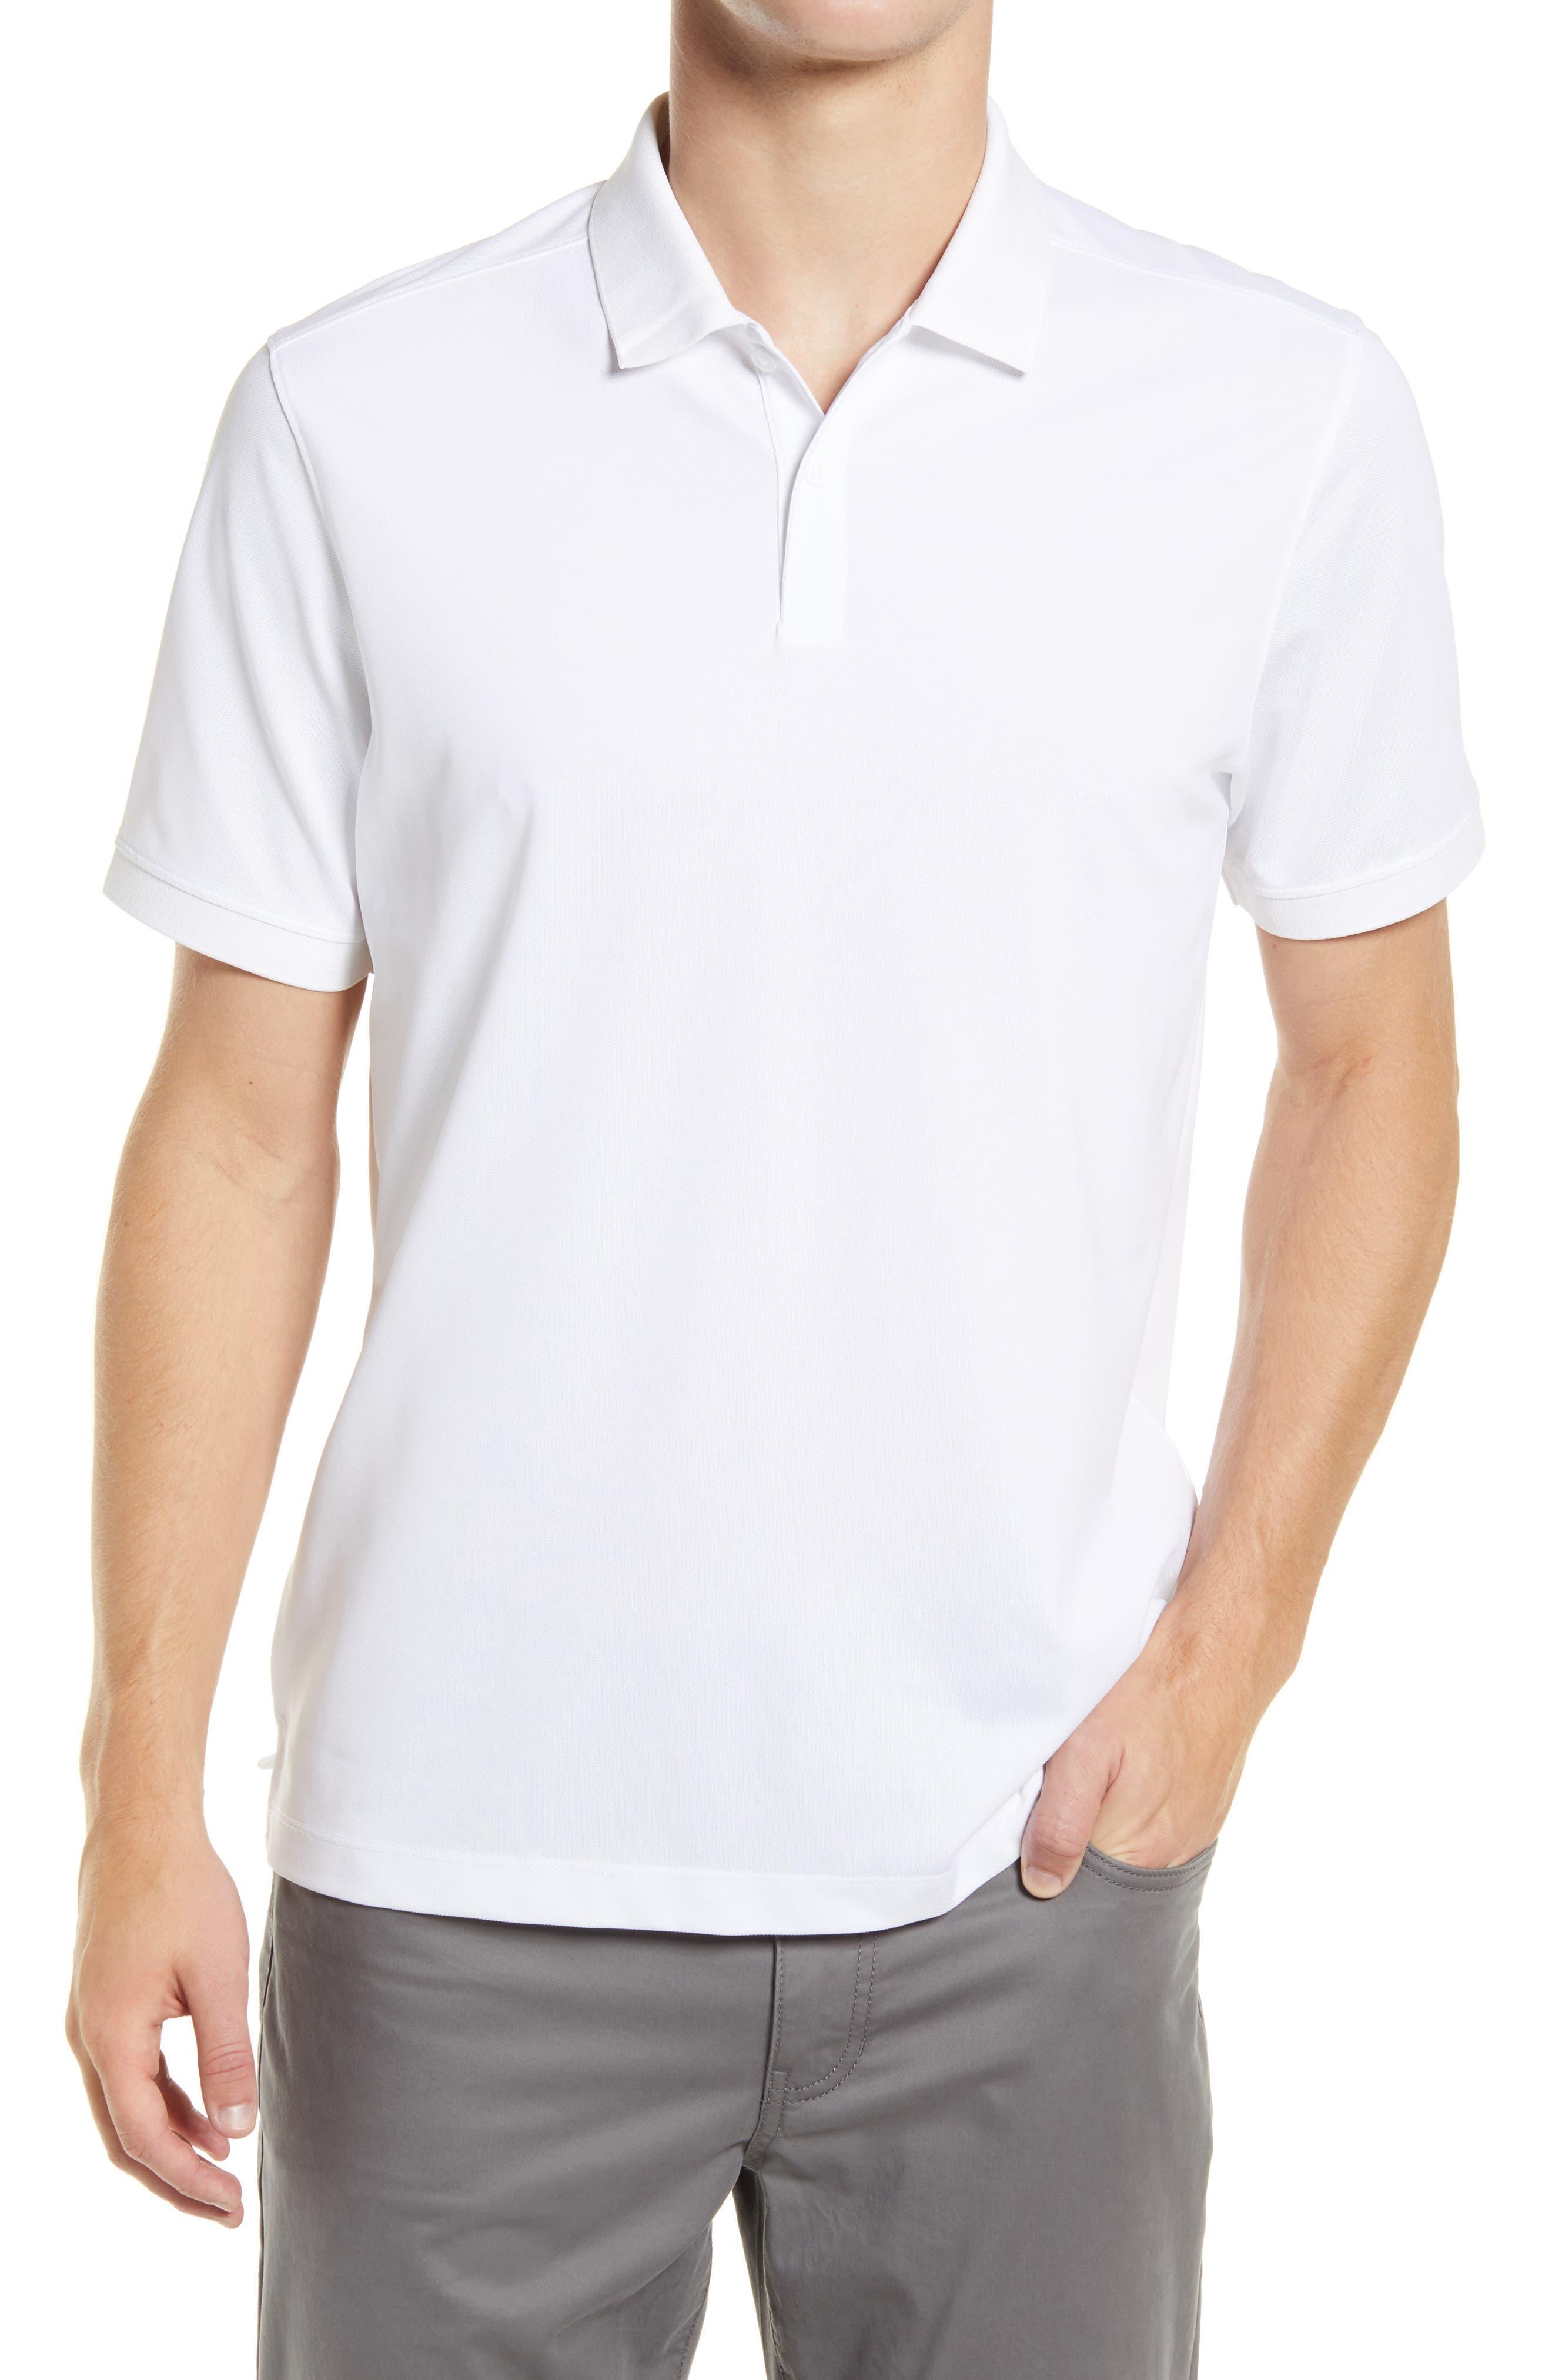 Men's Off-White Polo Shirts   Nordstrom